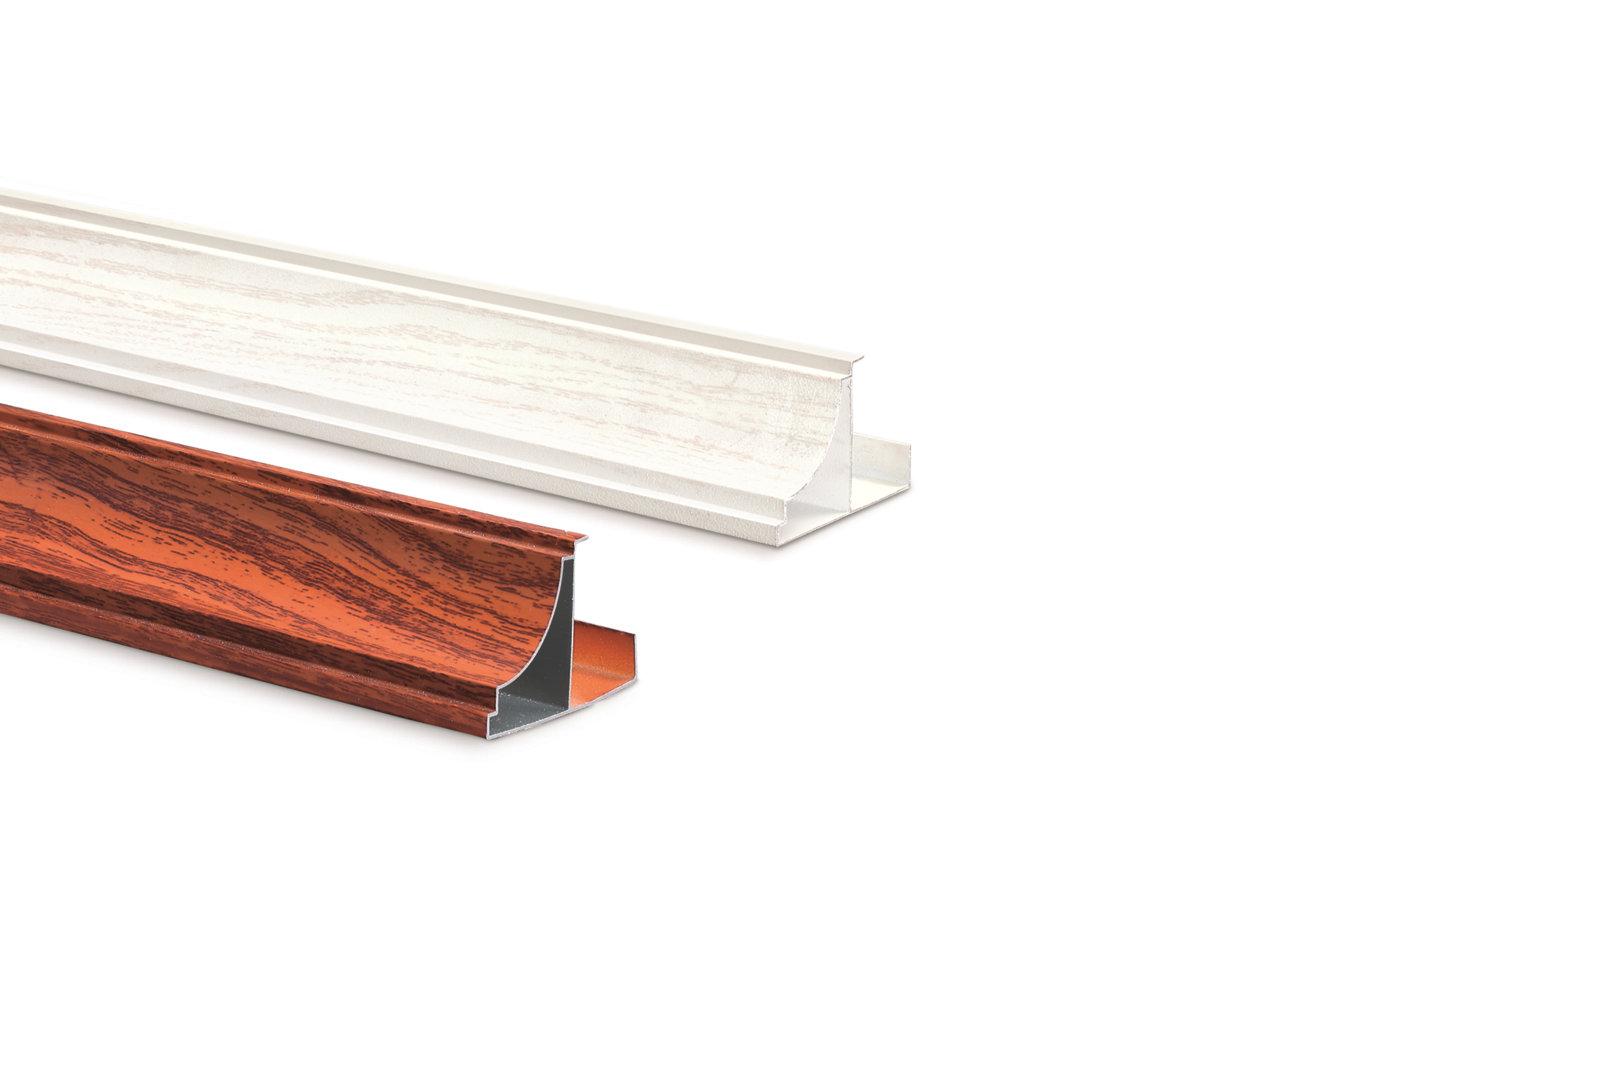 DT08 (红木纹、白橡木、浪花石、哑白)-1.jpg